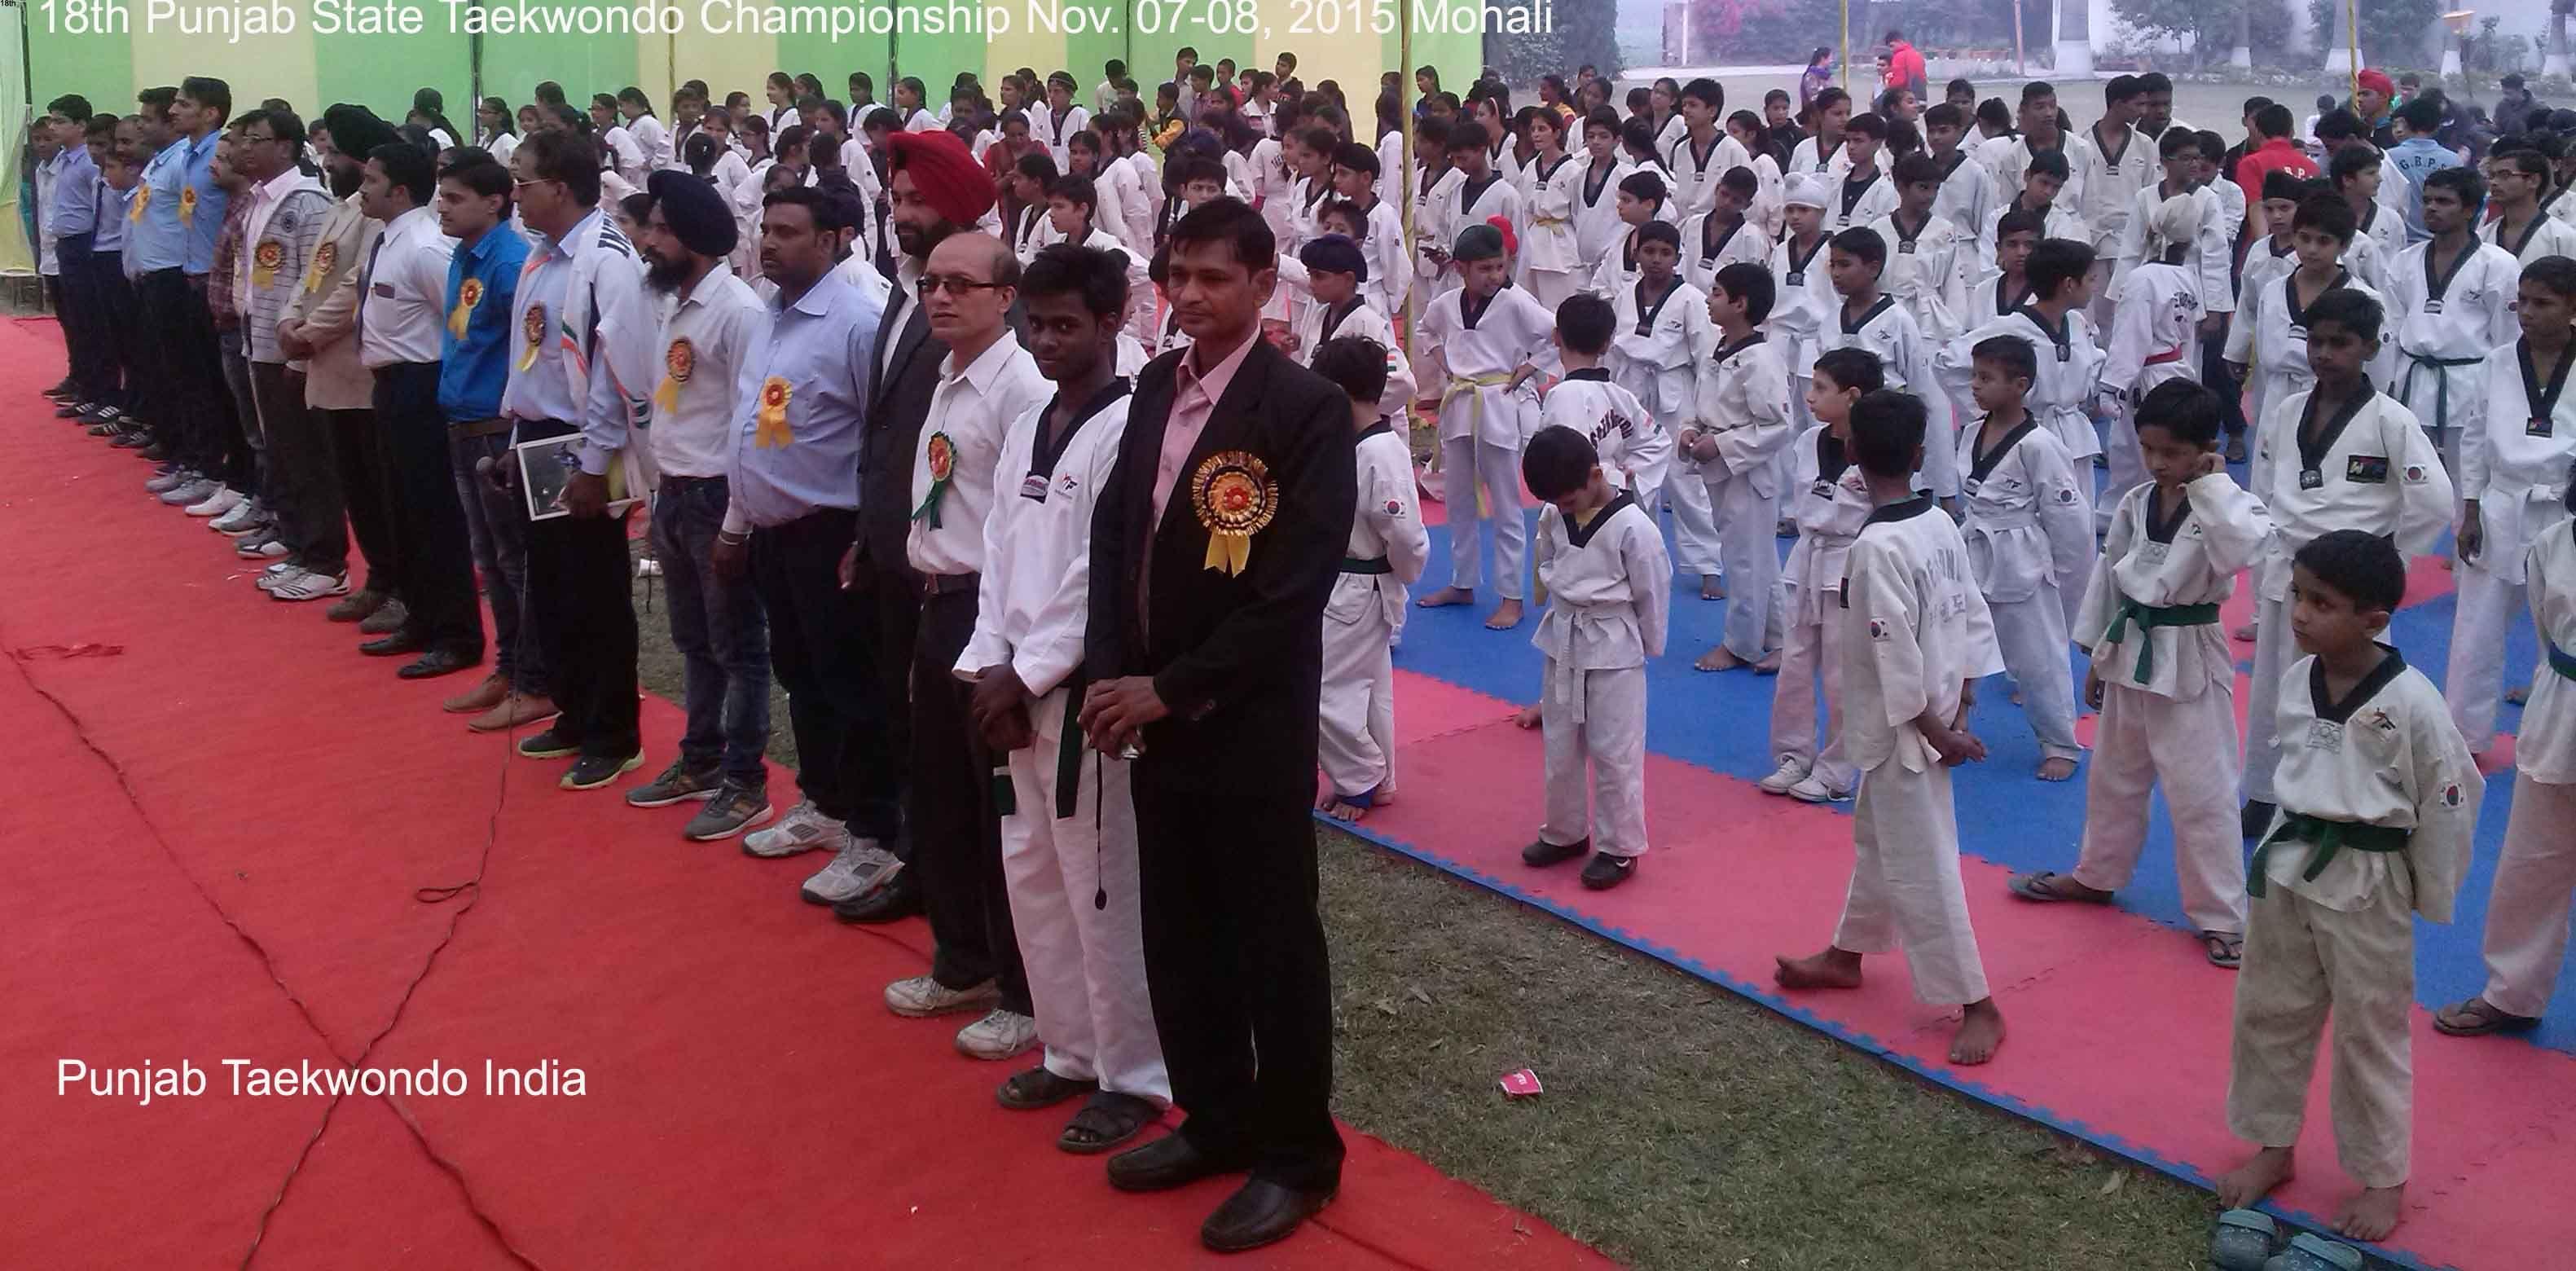 18th Punjab State Taekwondo Championship Mohali near Chanidgarh